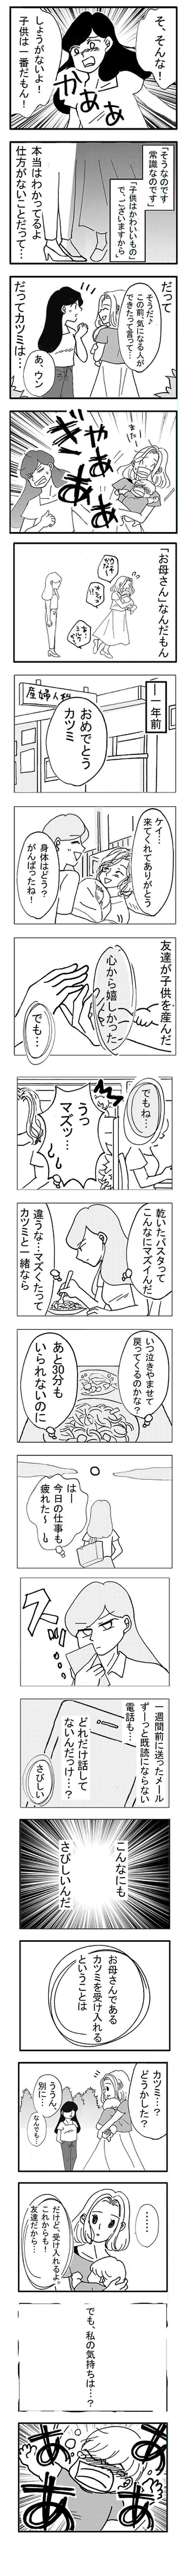 s_3.jpg